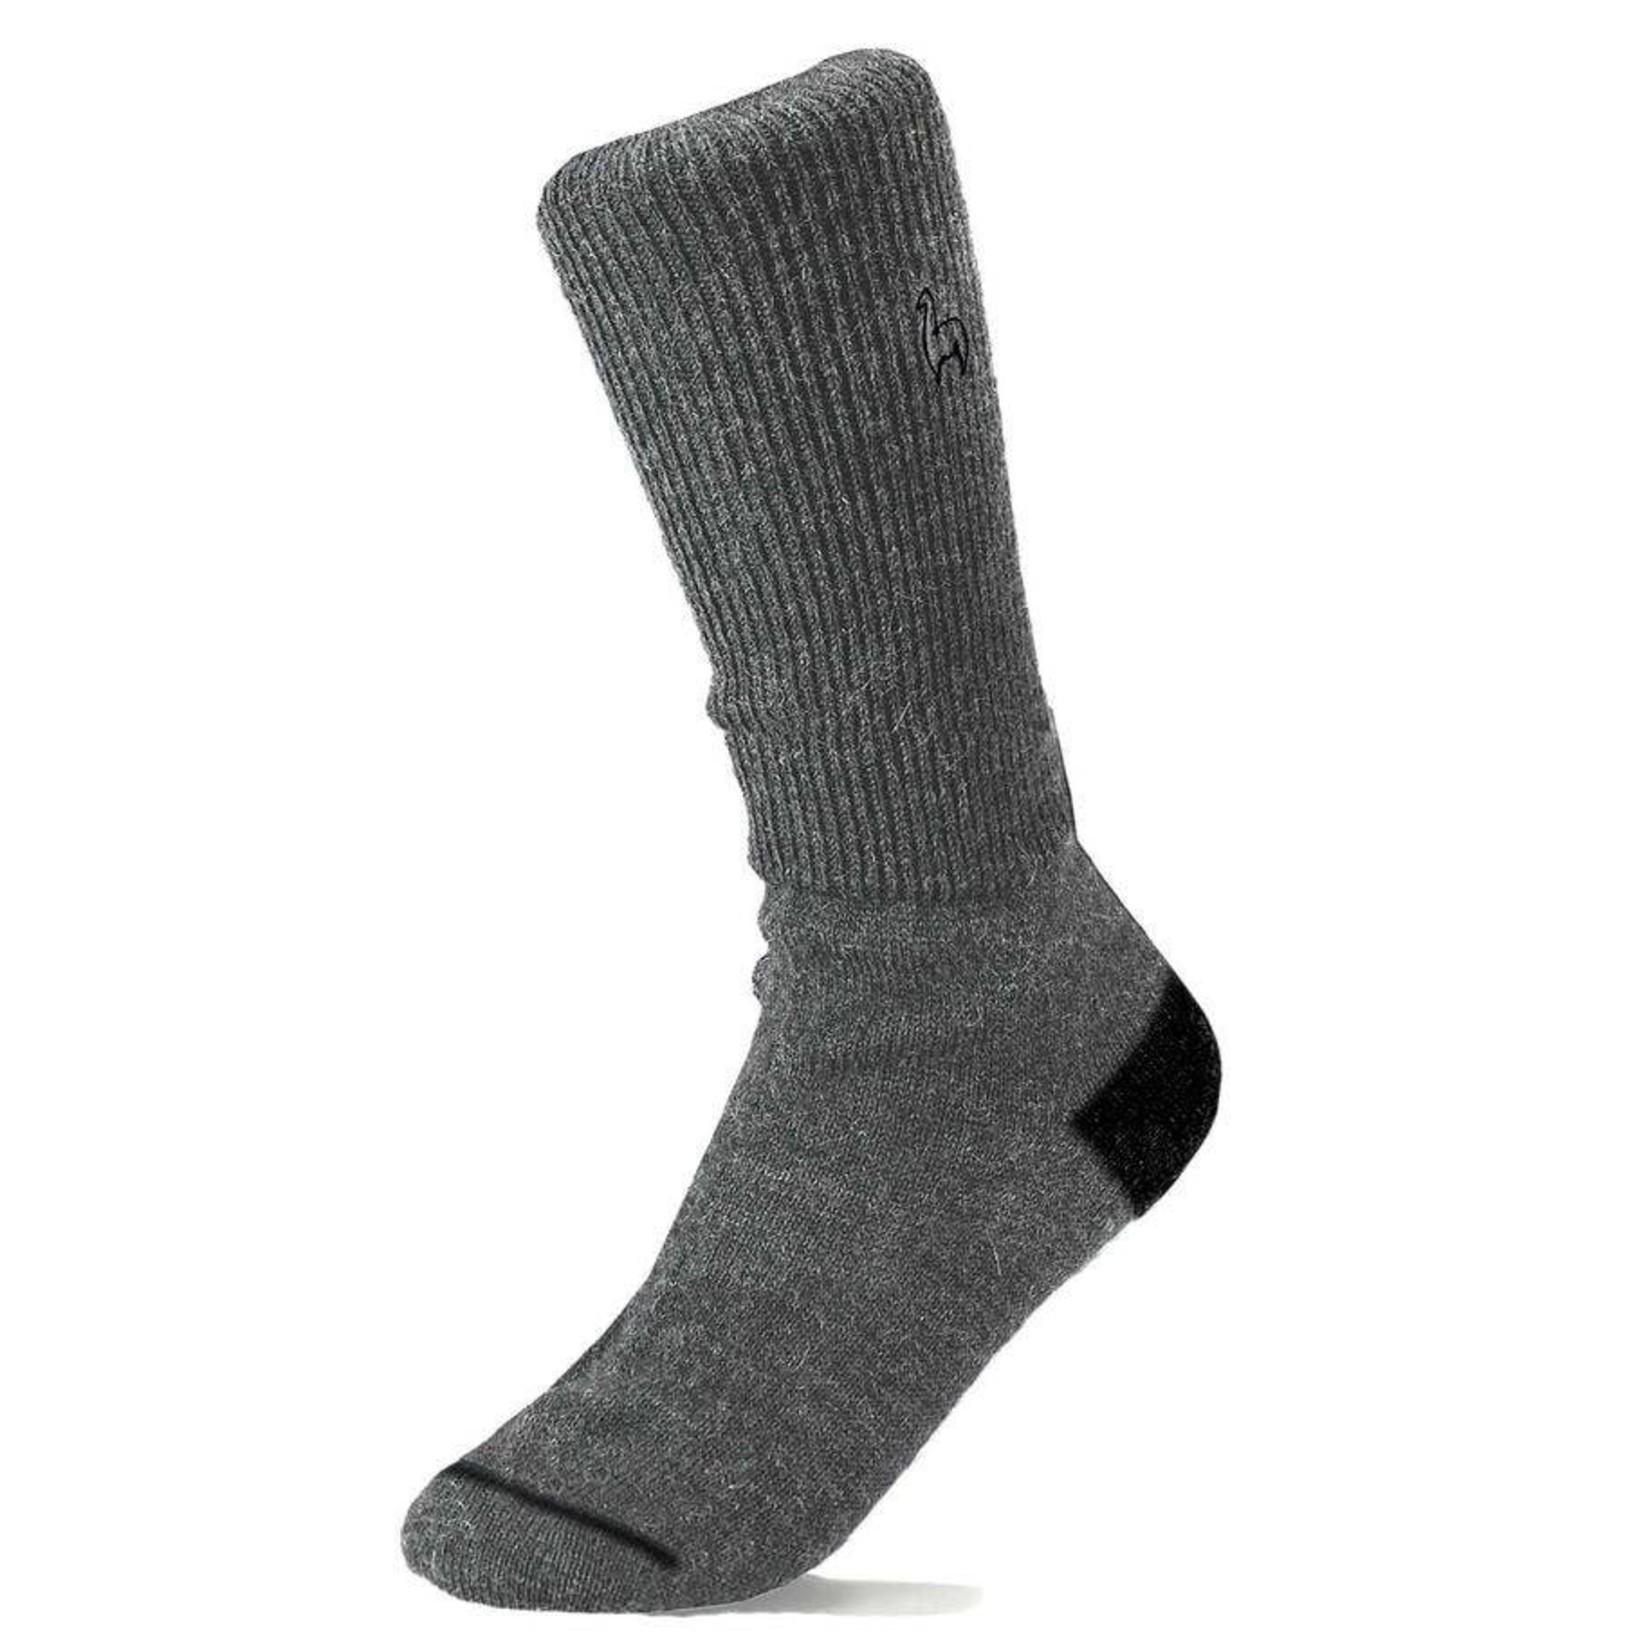 Alpaca Business Socks in Charcoal Sml